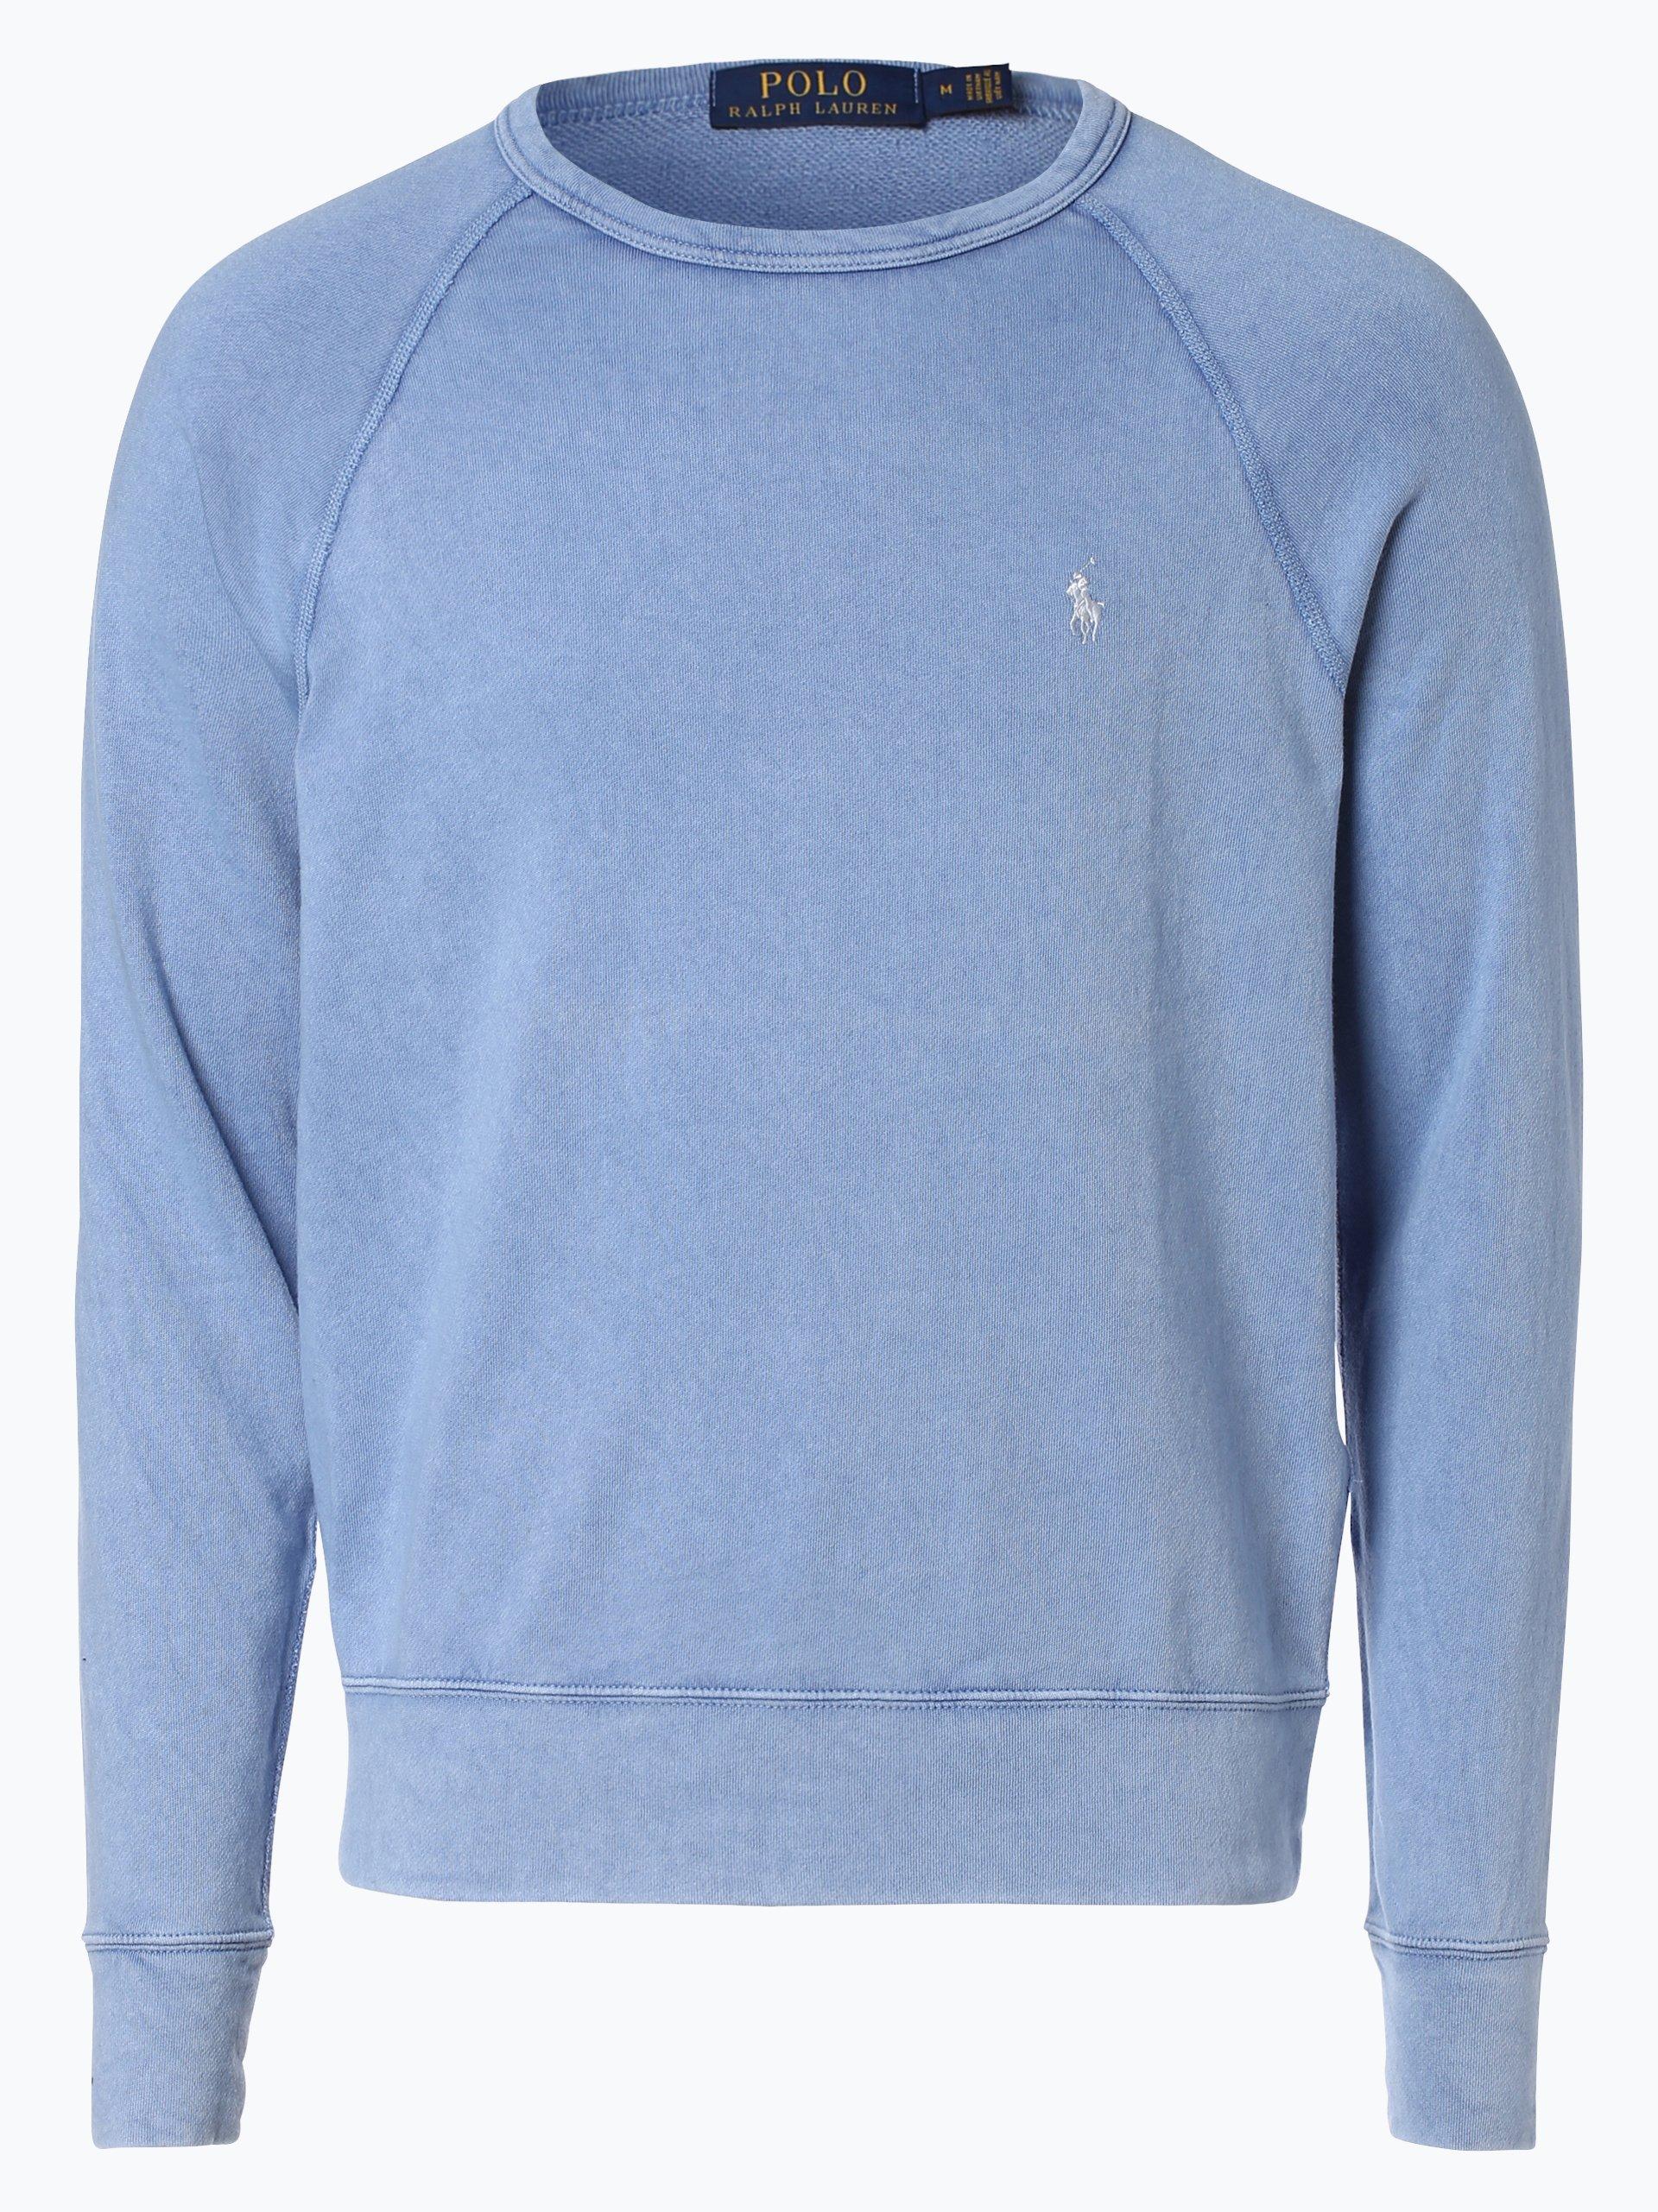 polo ralph lauren herren sweatshirt blau uni online kaufen. Black Bedroom Furniture Sets. Home Design Ideas